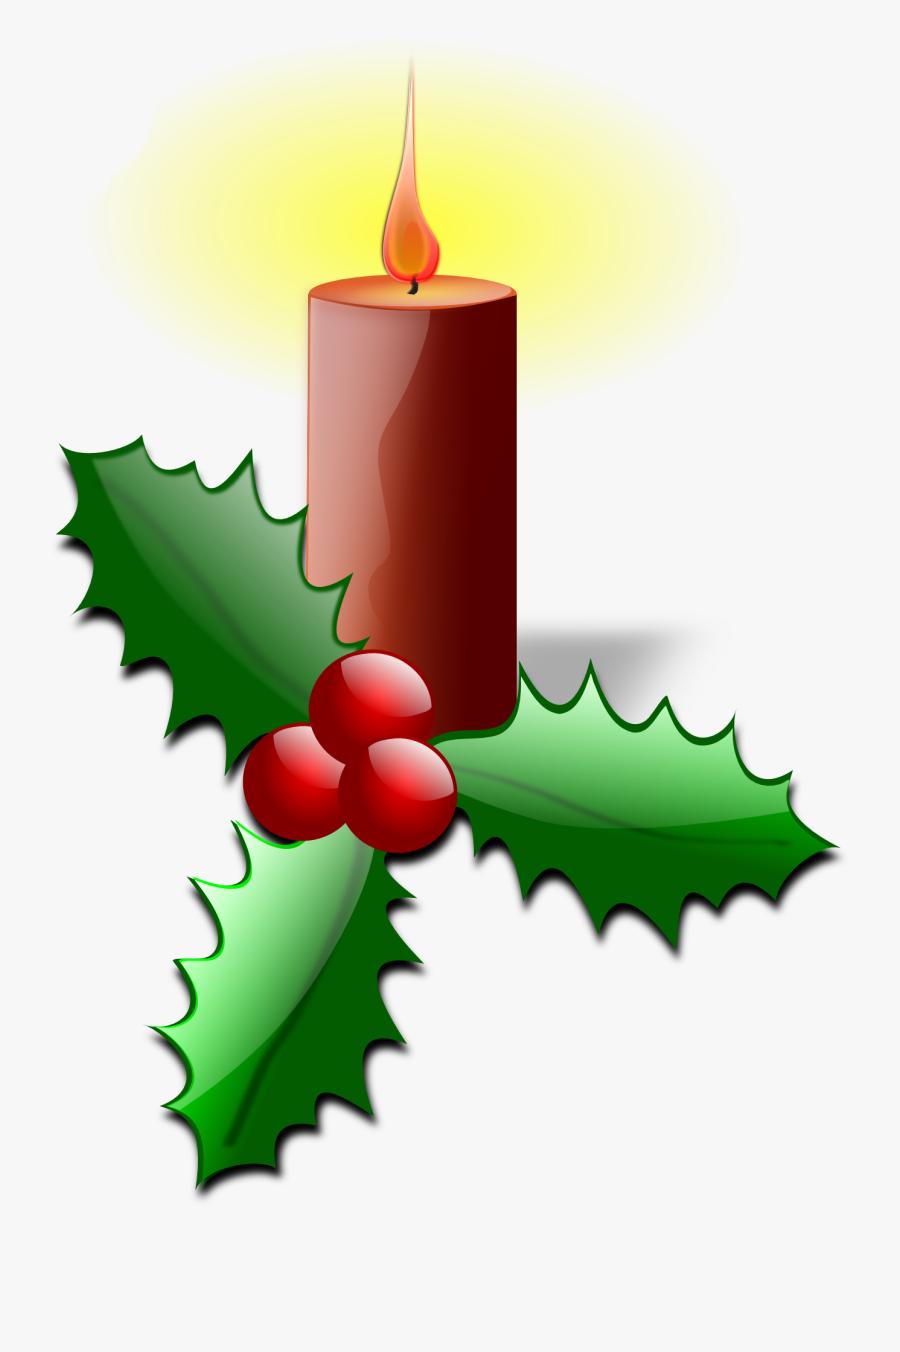 Candle Clipart Christmas Stuff - Clip Art Christmas Designs, Transparent Clipart